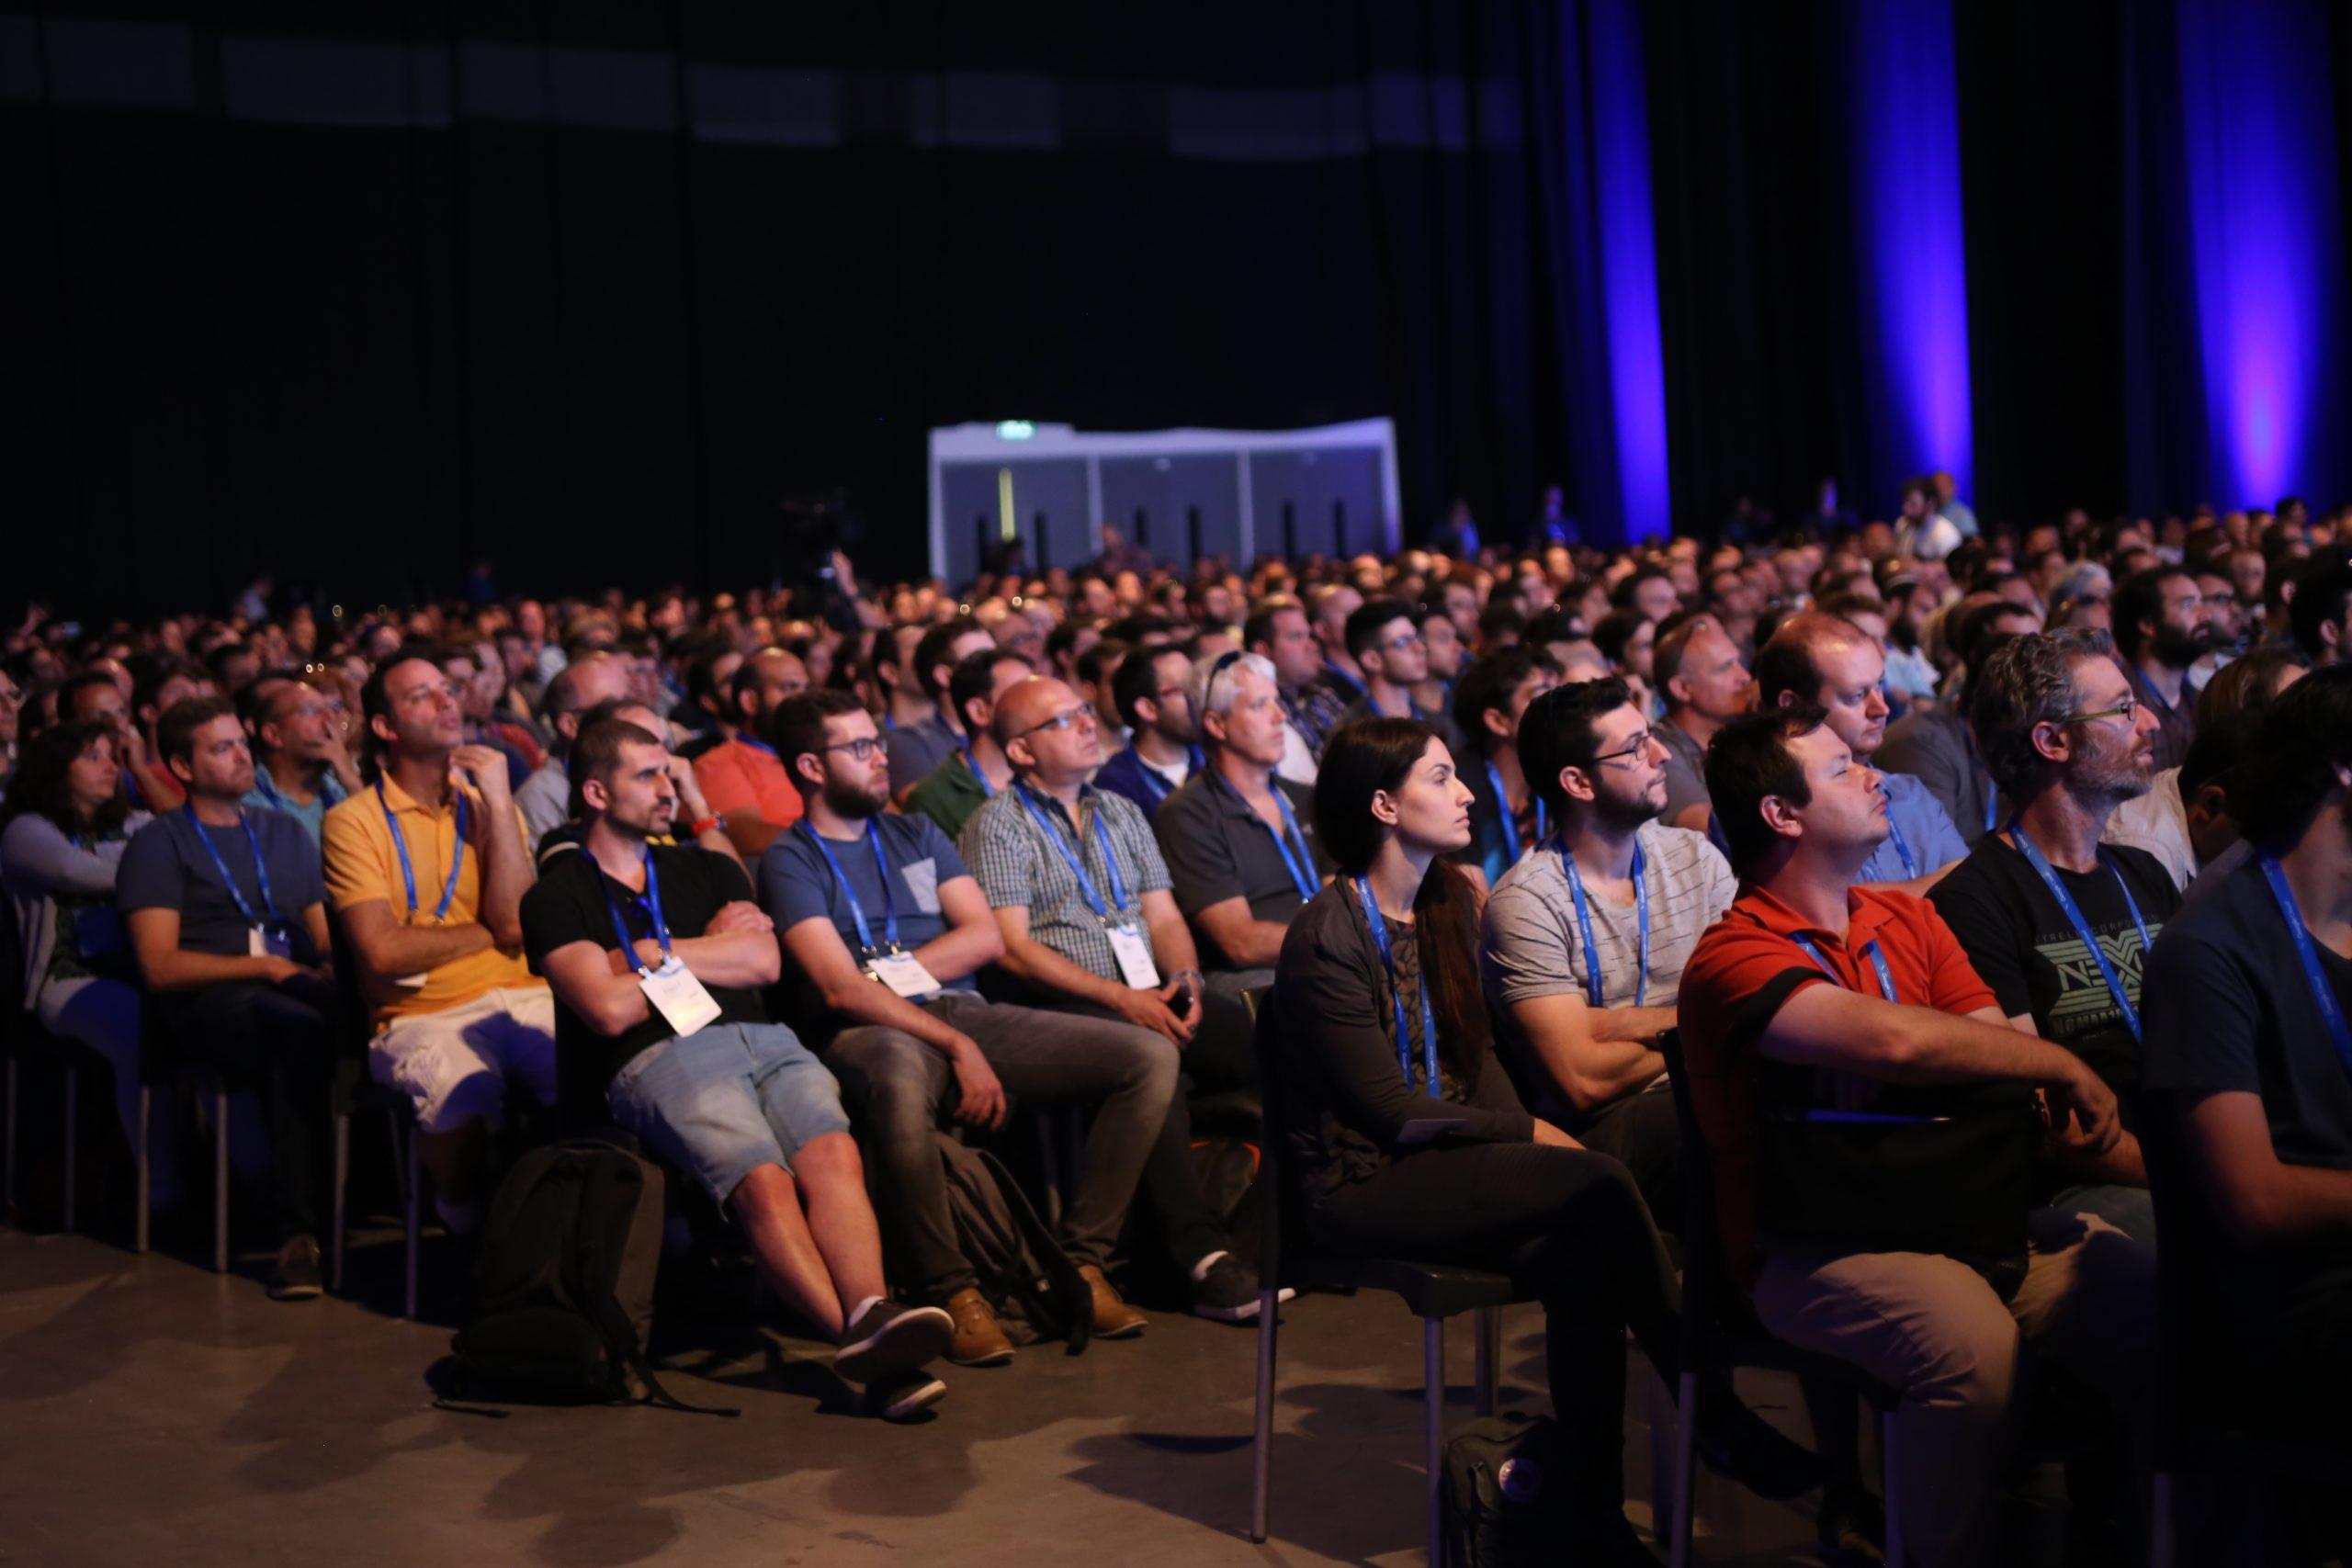 Technology Conferences: TechnologyConferences.com, domain name for sale